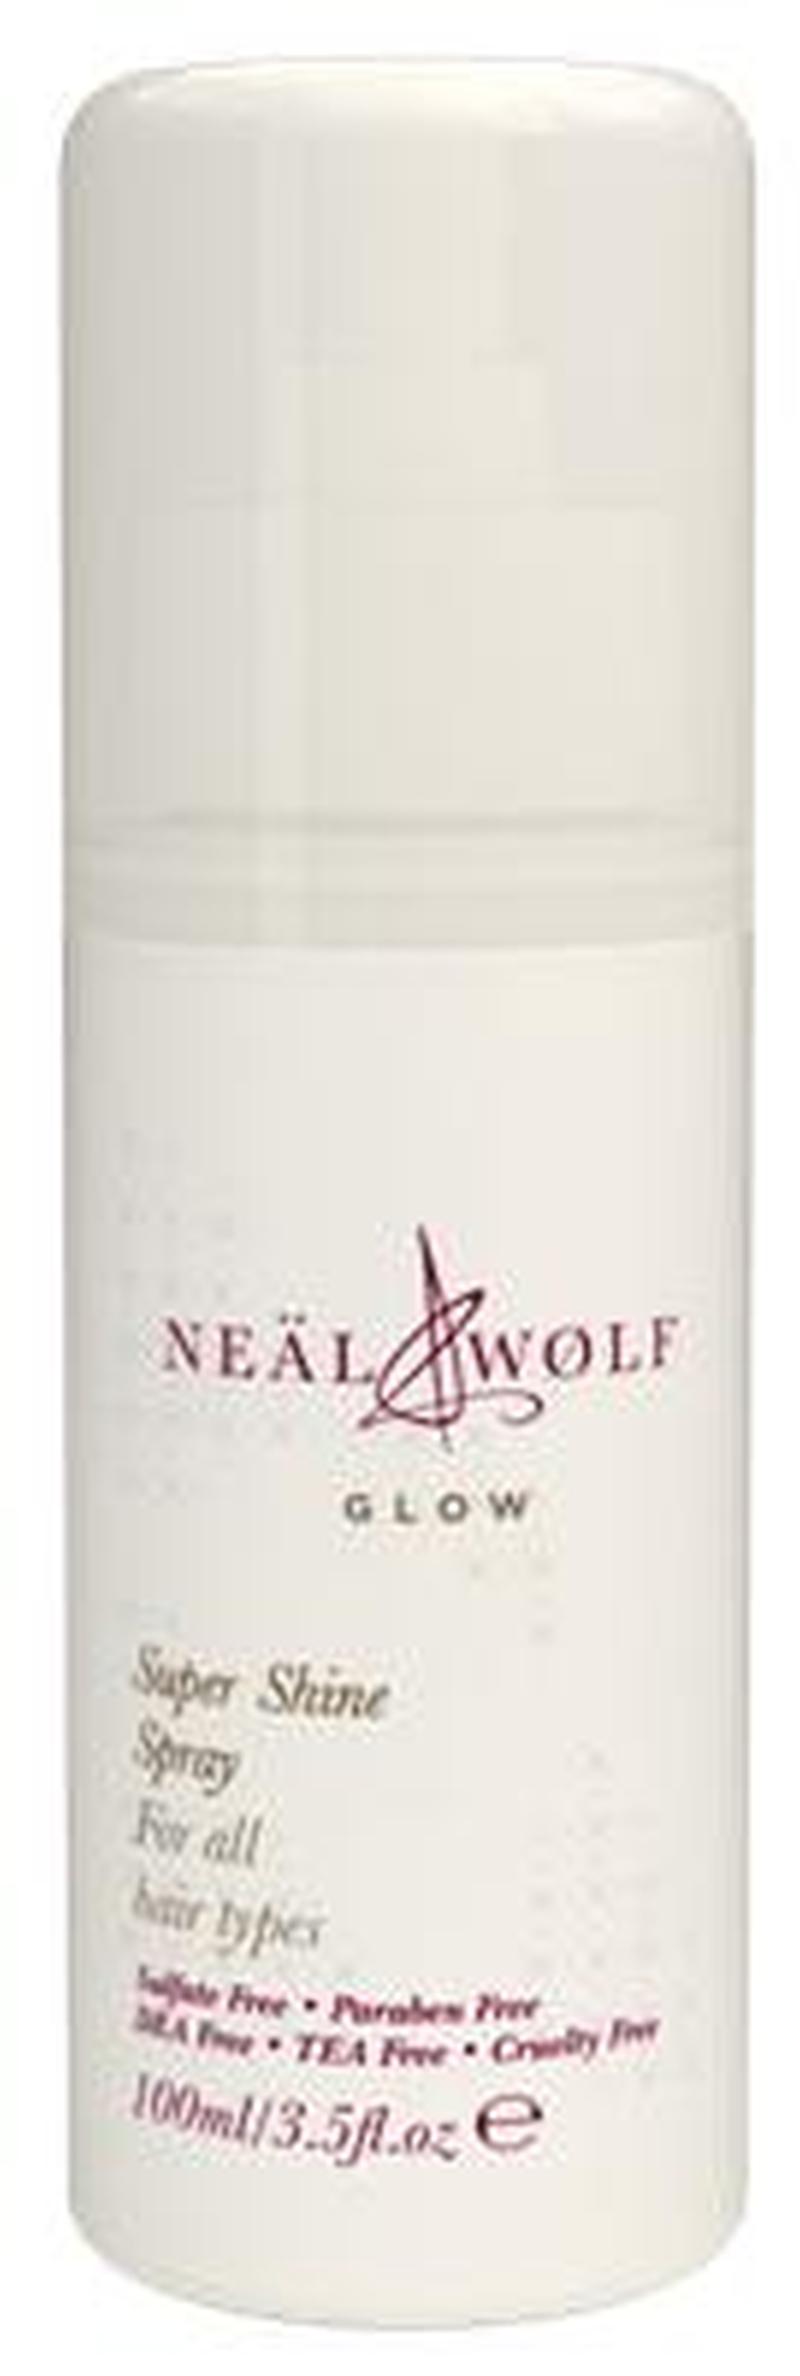 Neal and Wolf Glow Super Shine Spray 100ml